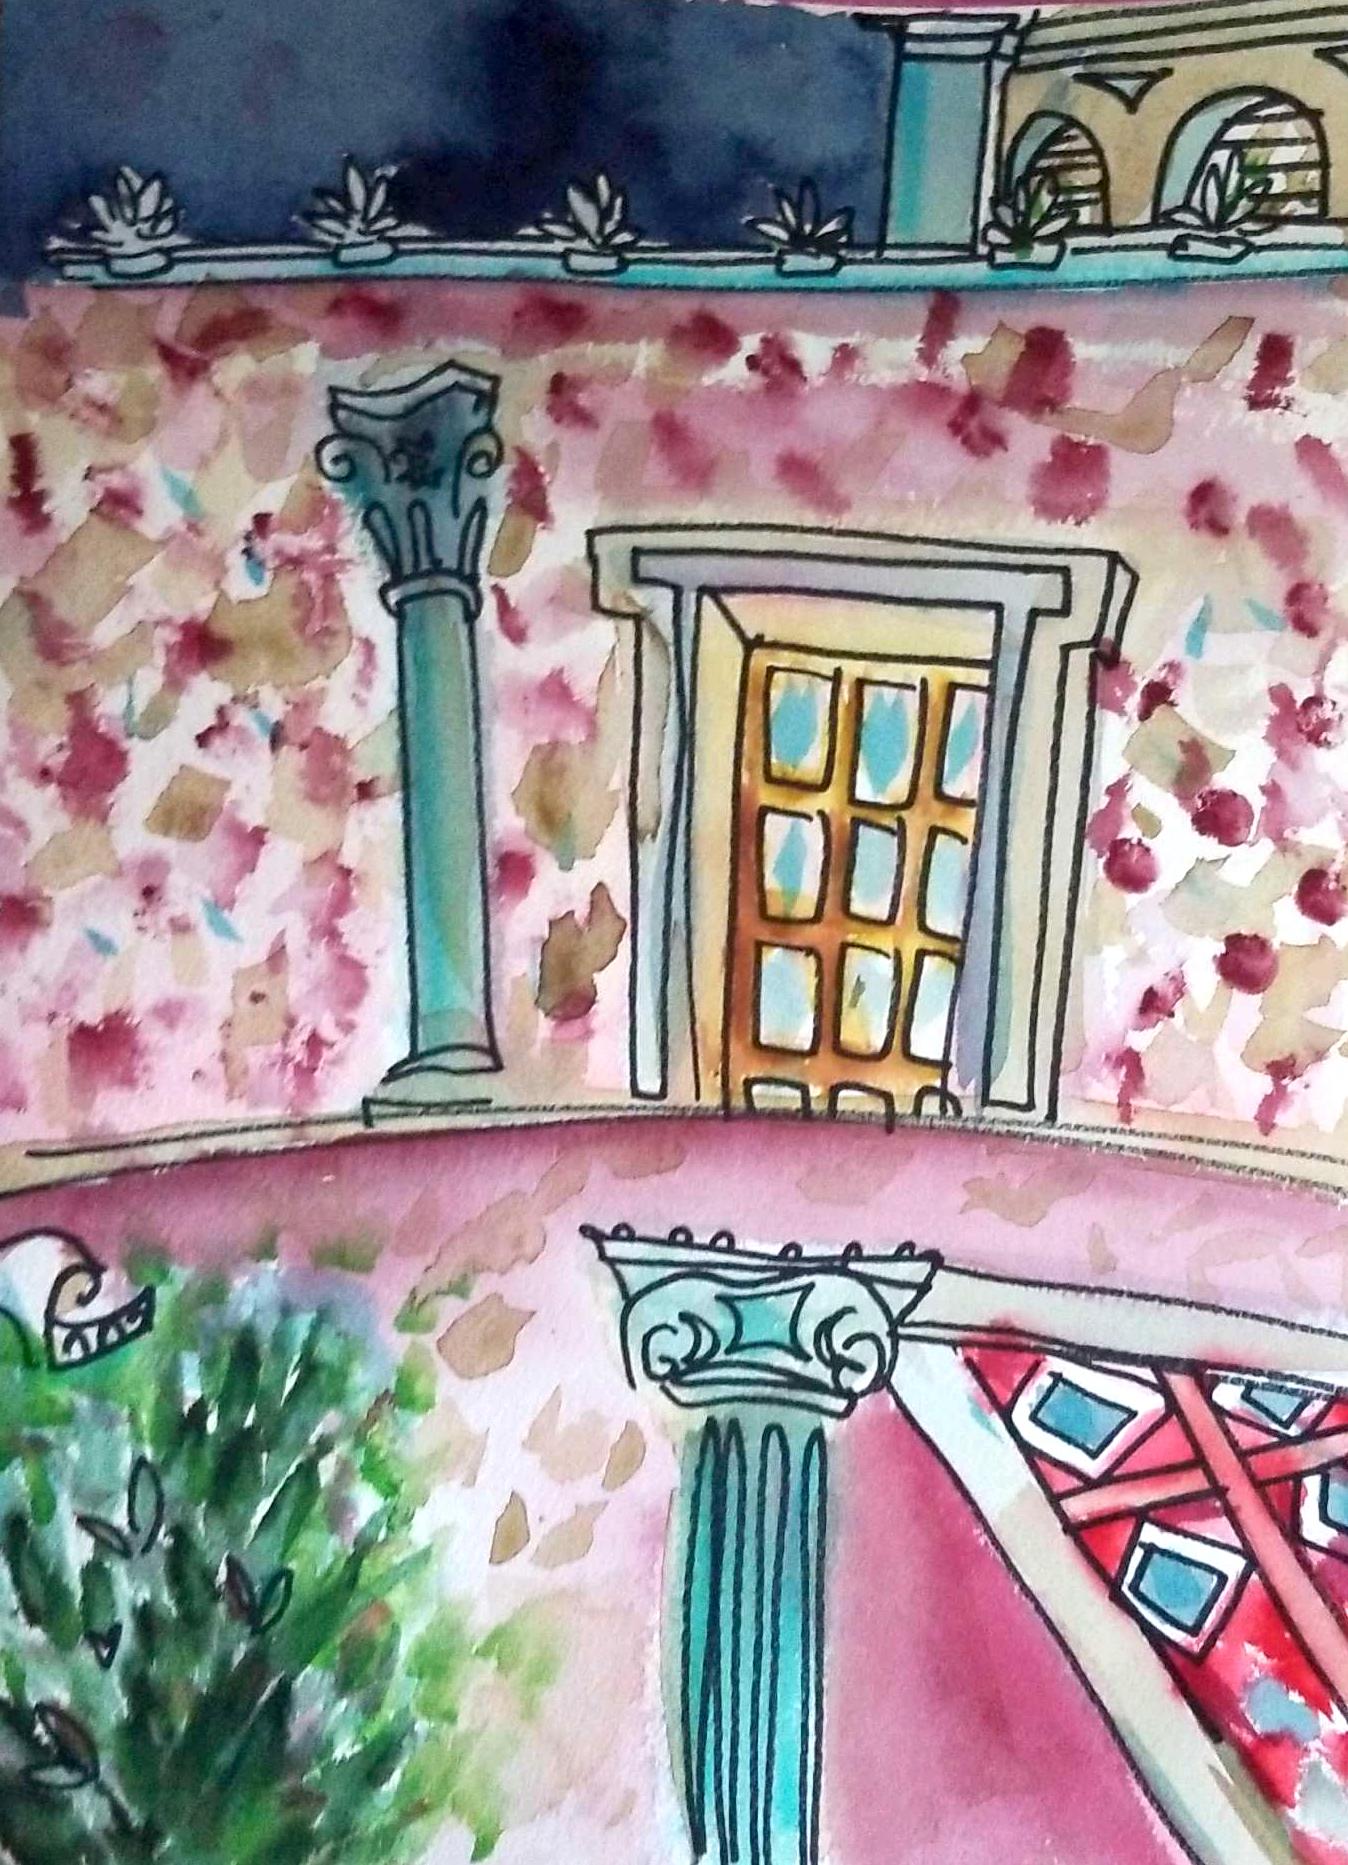 LA Getty watercolor